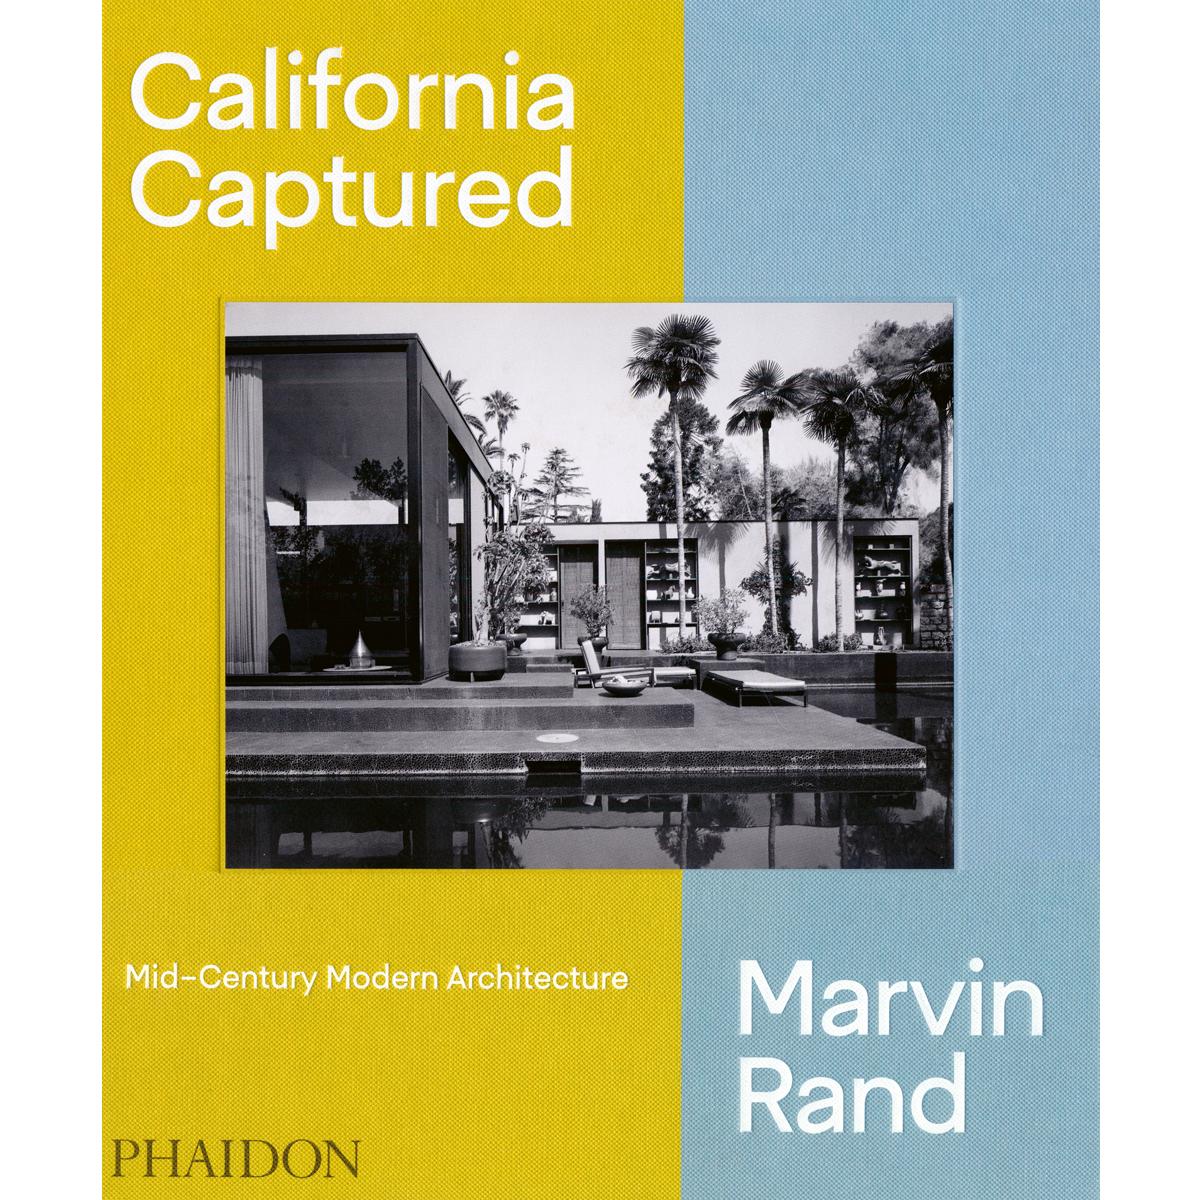 Marvin Rand. California Captured